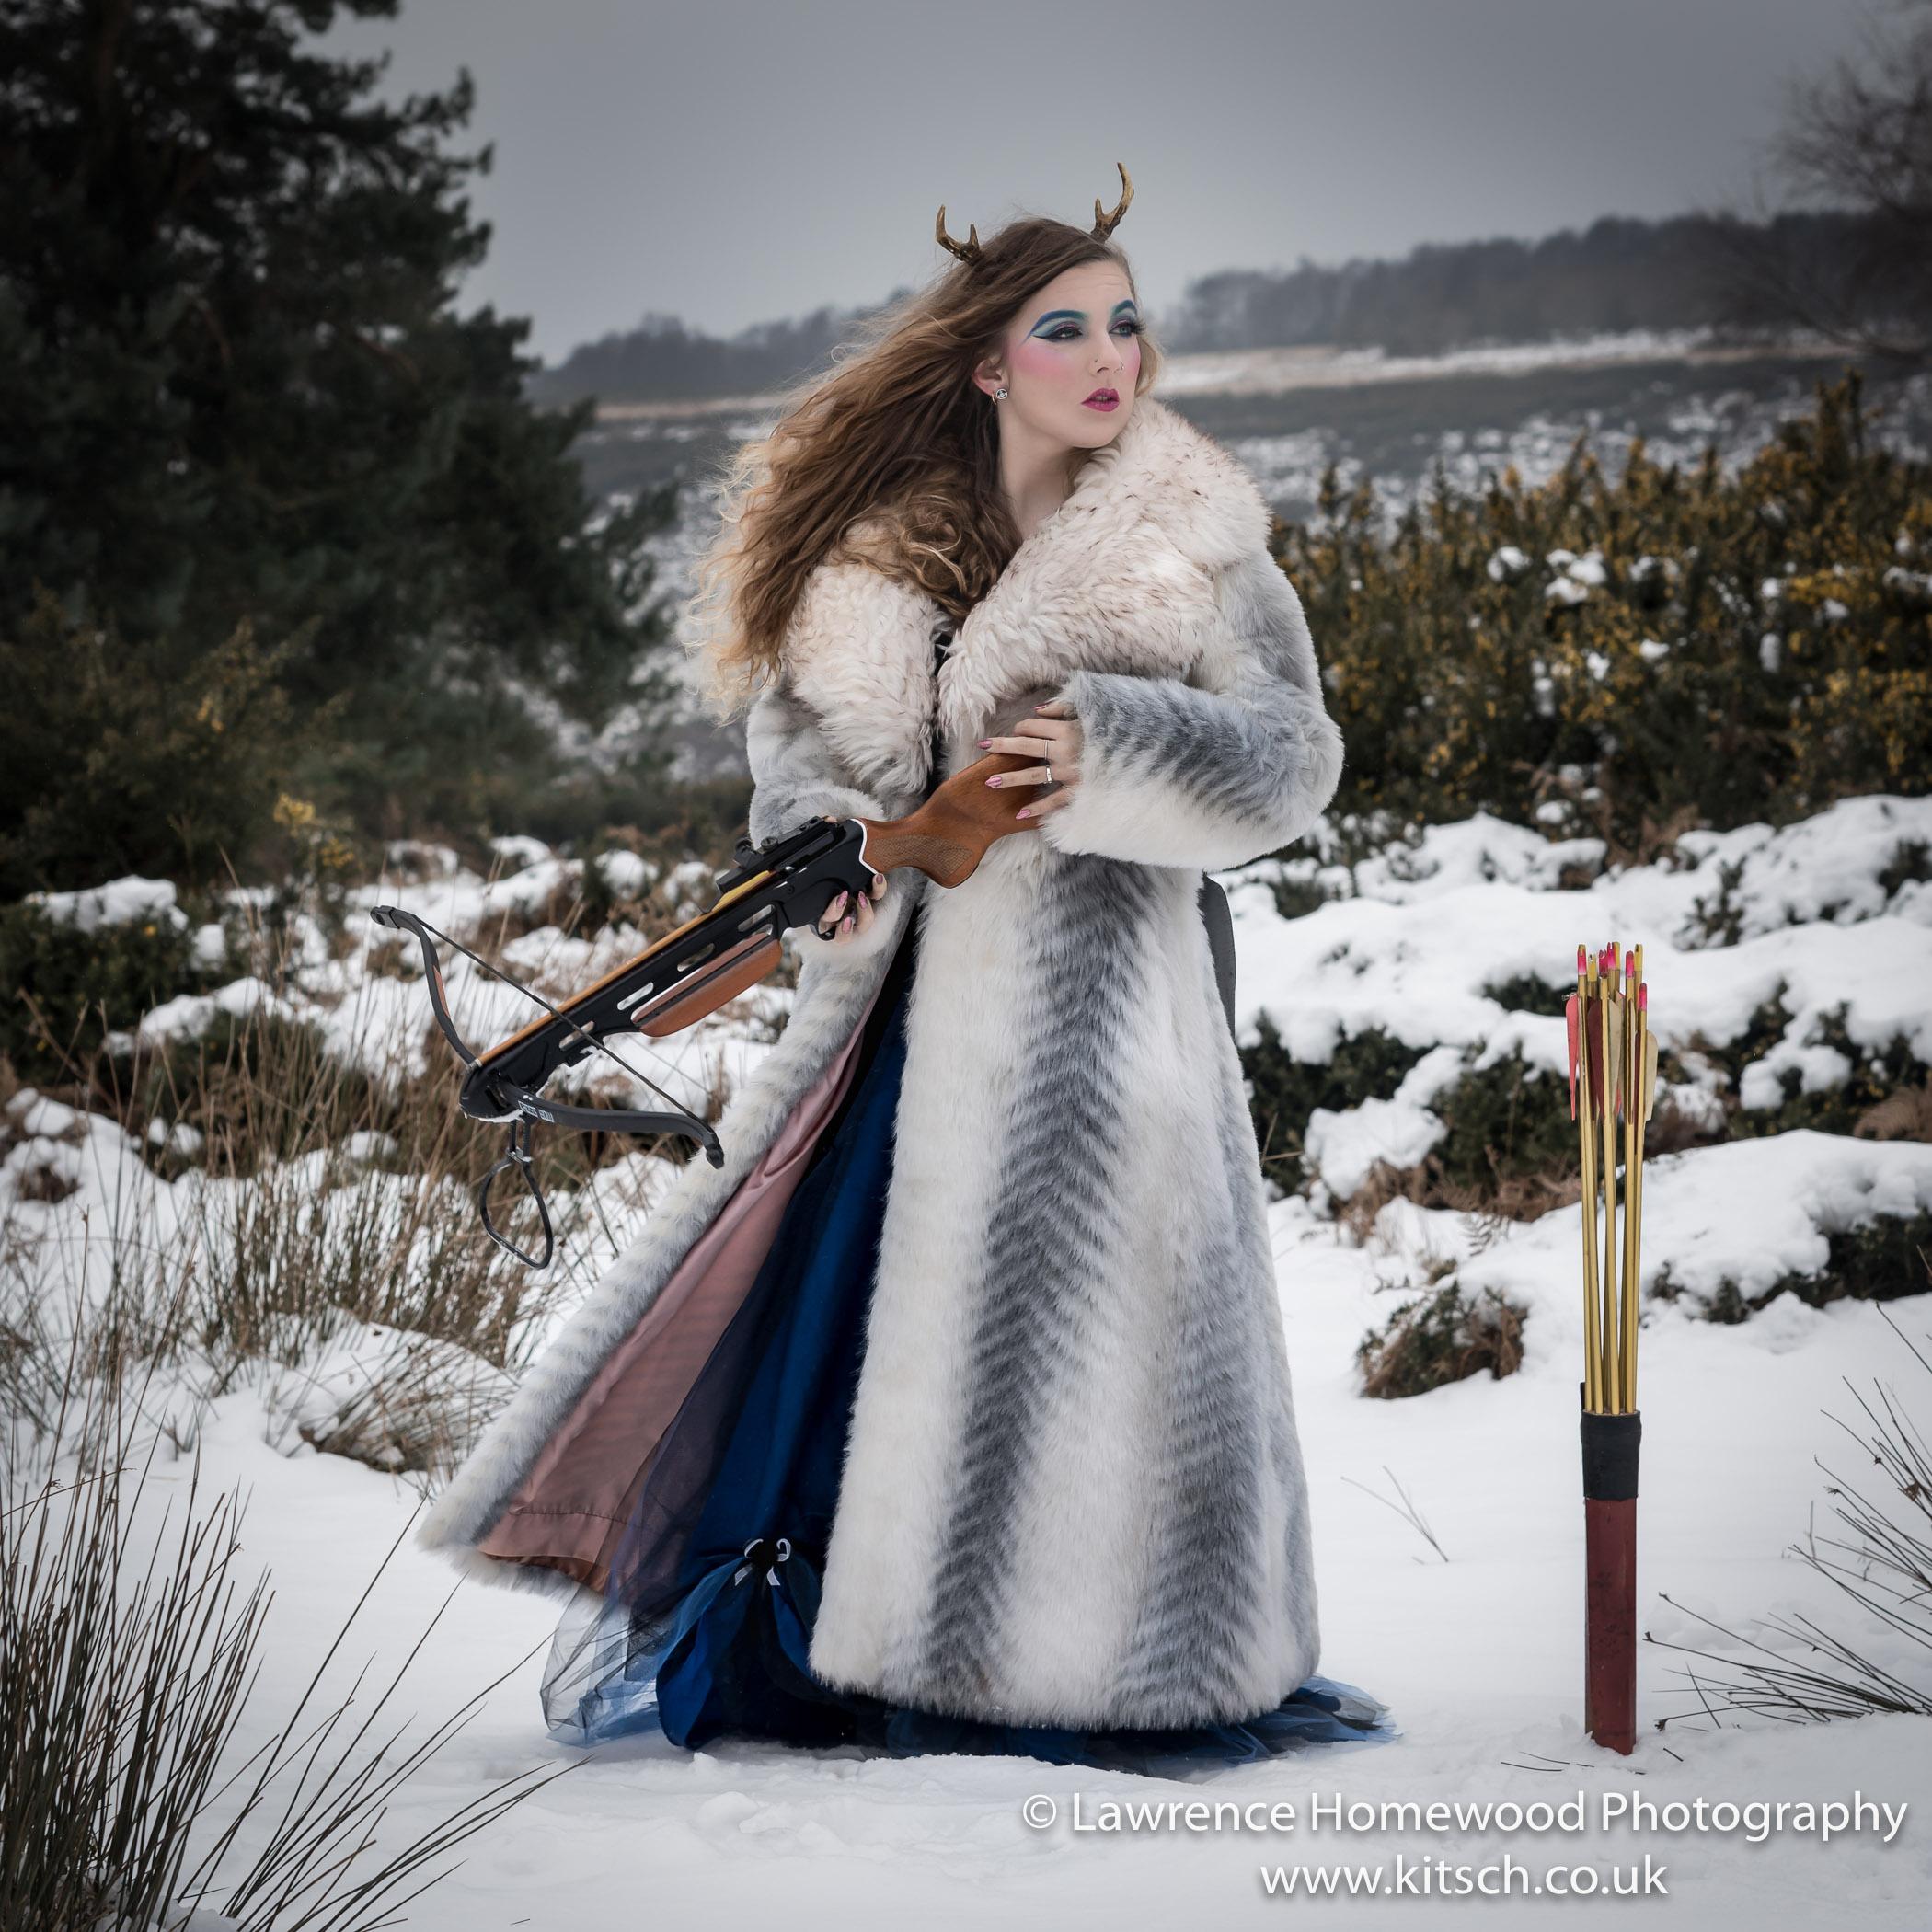 Fawn Princess - A Winters Tale05